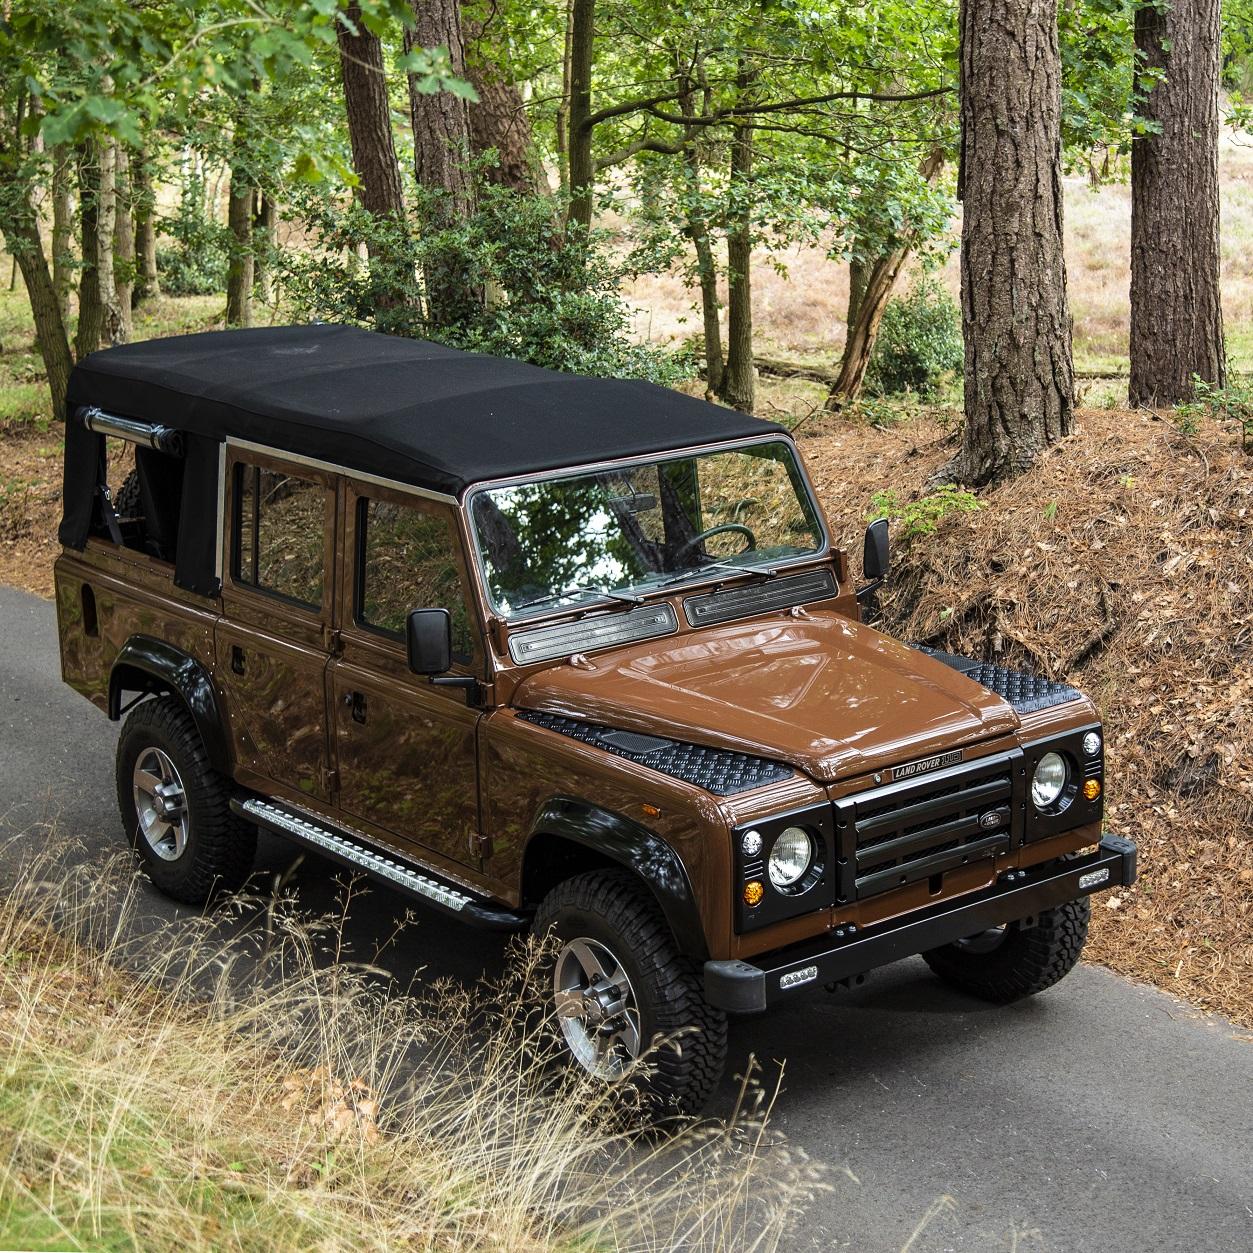 russet-brown-soft-top-land-rover-defender-www.oliversclassics.com